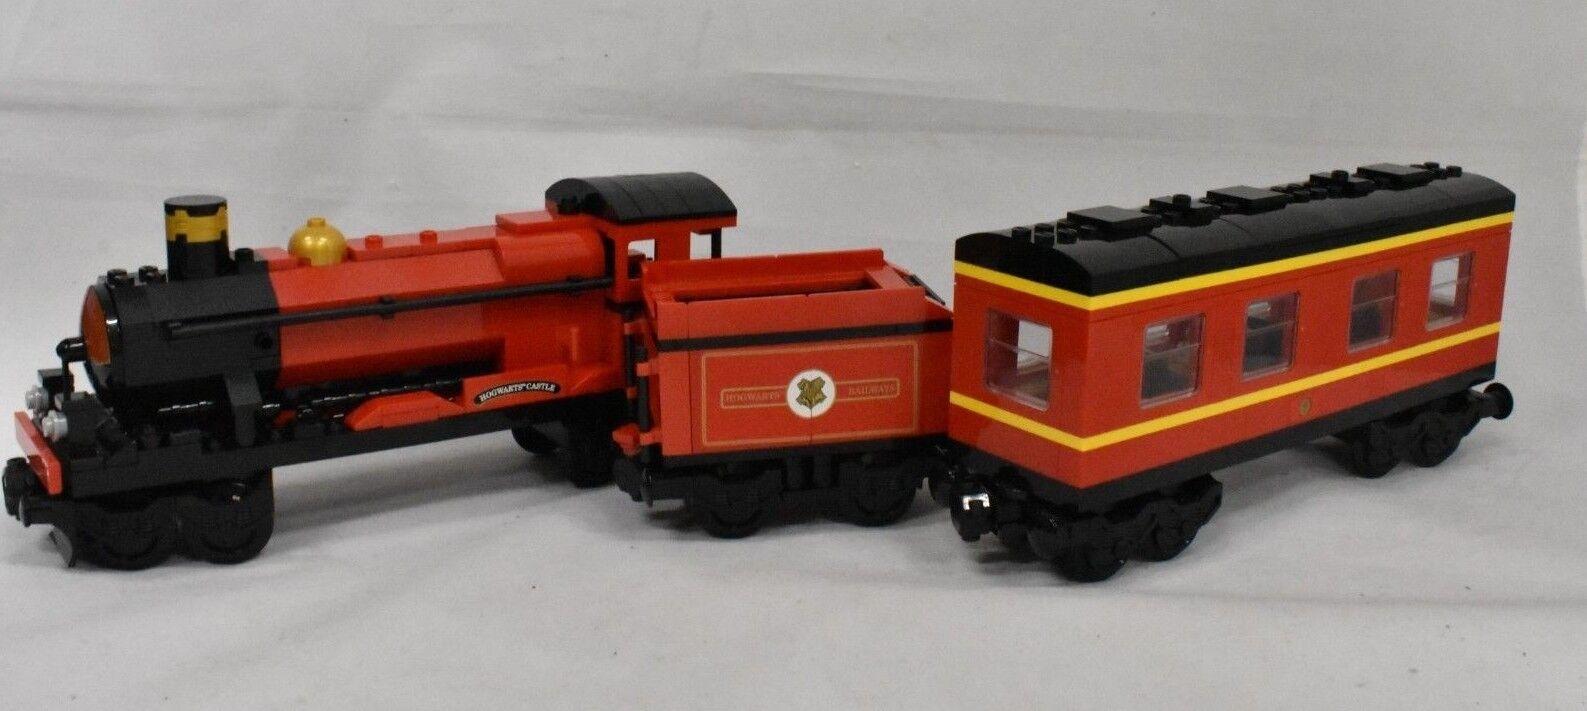 consegna rapida Lego Harry Potter Potter Potter HOGWARTS EXPRESS TRAIN Engine Tender Passenger auto 4841 AIEA  offerta speciale